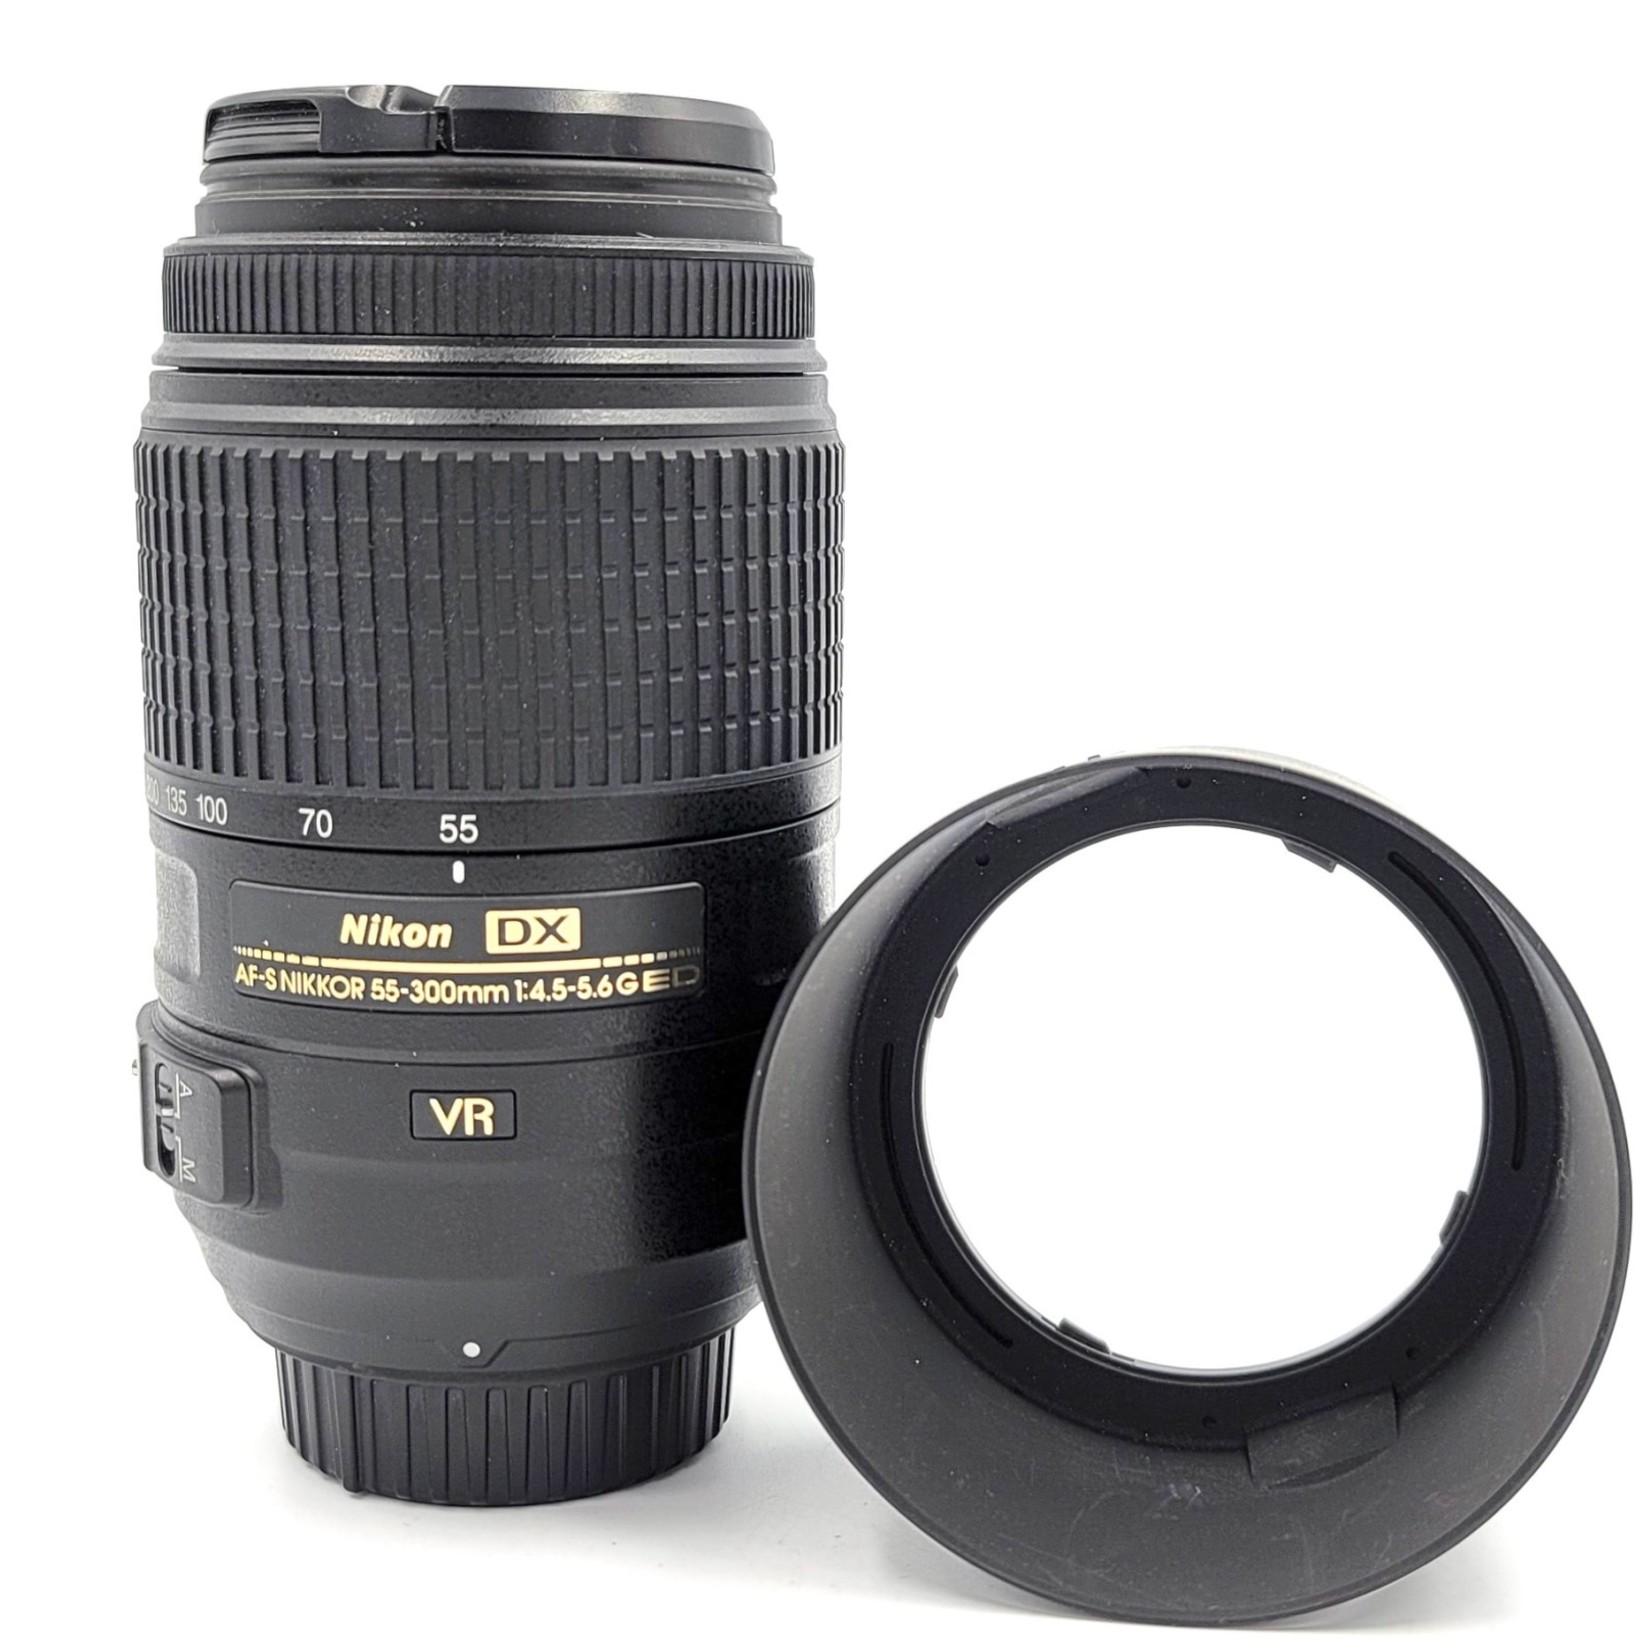 Nikon #1080 USED Nikon DX 55-300mm f/4.5-5.6  VR G ED Lens